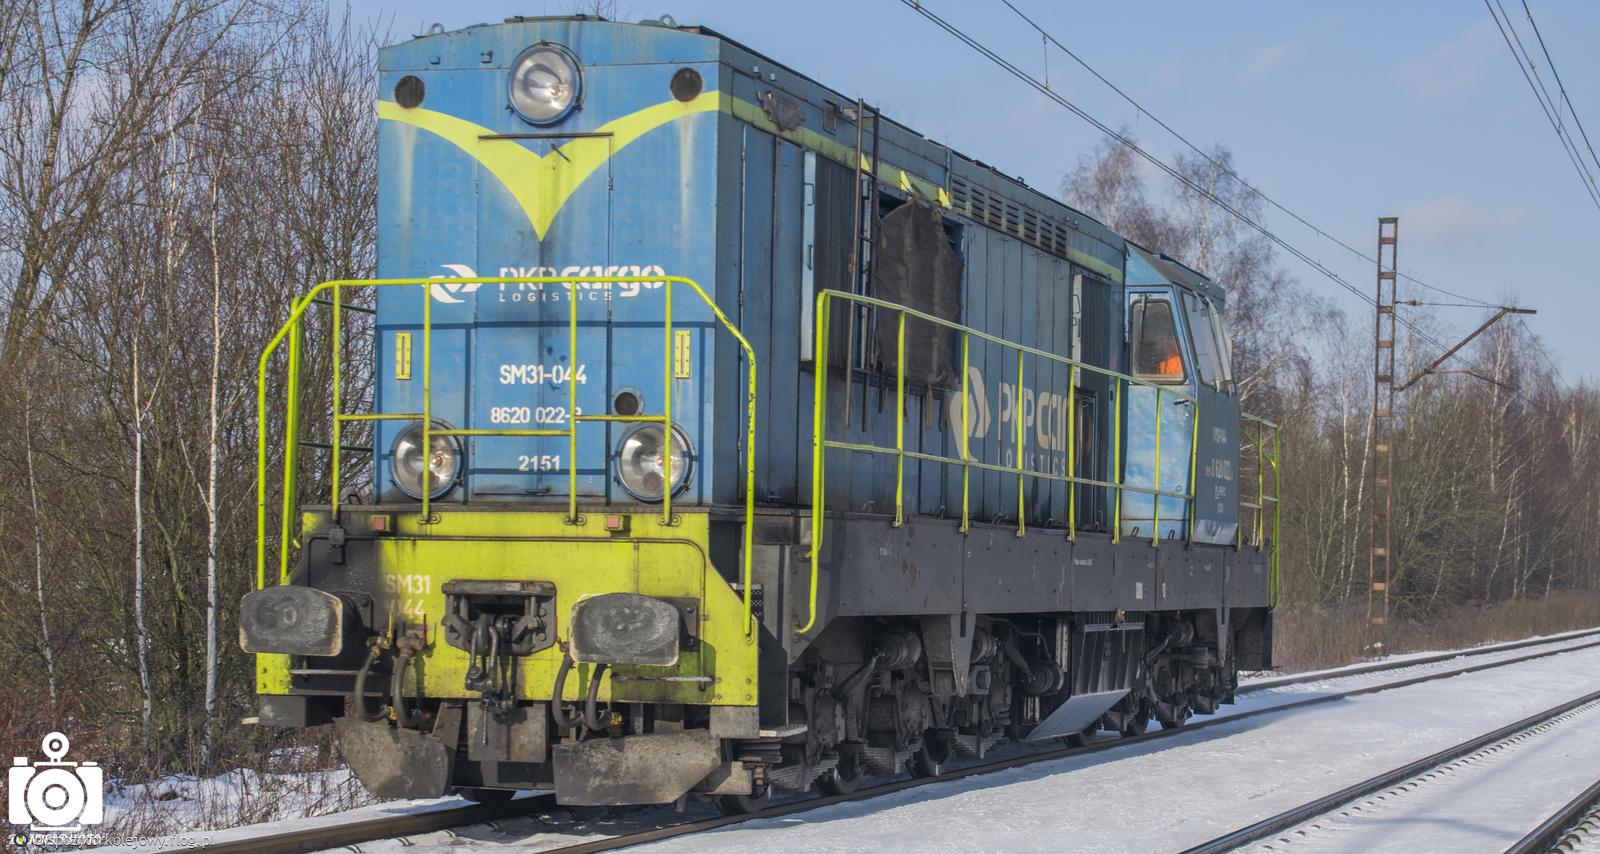 SM31-044